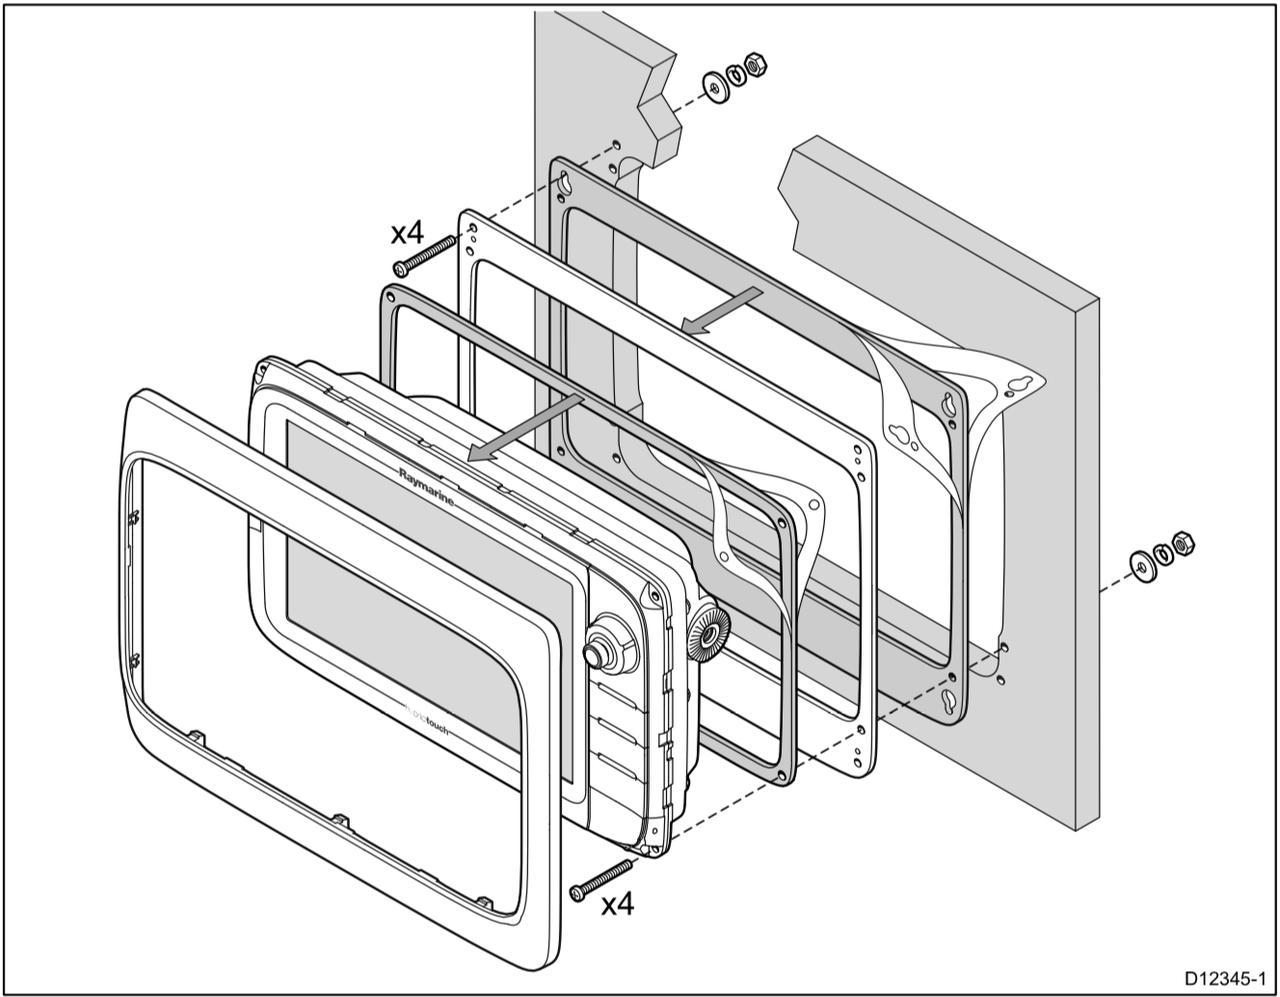 garmin 2010c chartplotter wiring diagrams wiring diagrams raymarine c9 e9 mounting adaptor kit for c80e80 cutout 86470 1437743912 1280 1280 c 2 [ 1280 x 997 Pixel ]